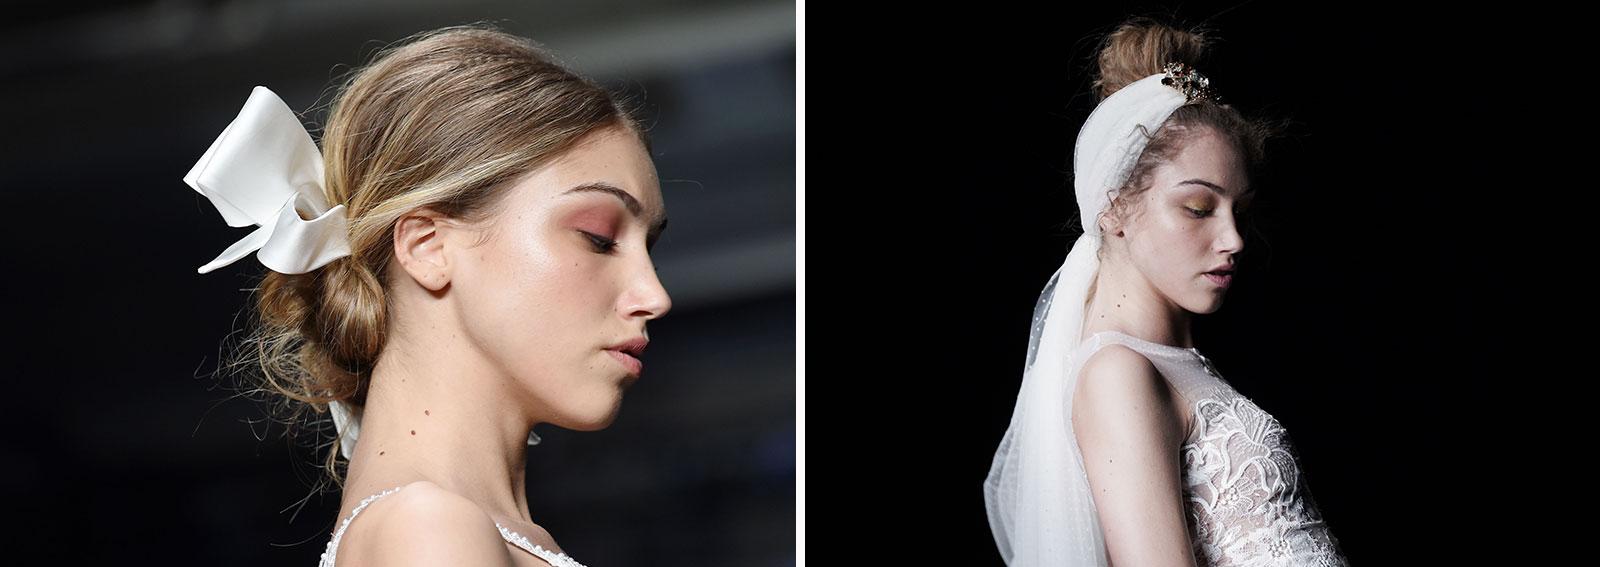 acconciature-sposa-2019-tendenze-desktop